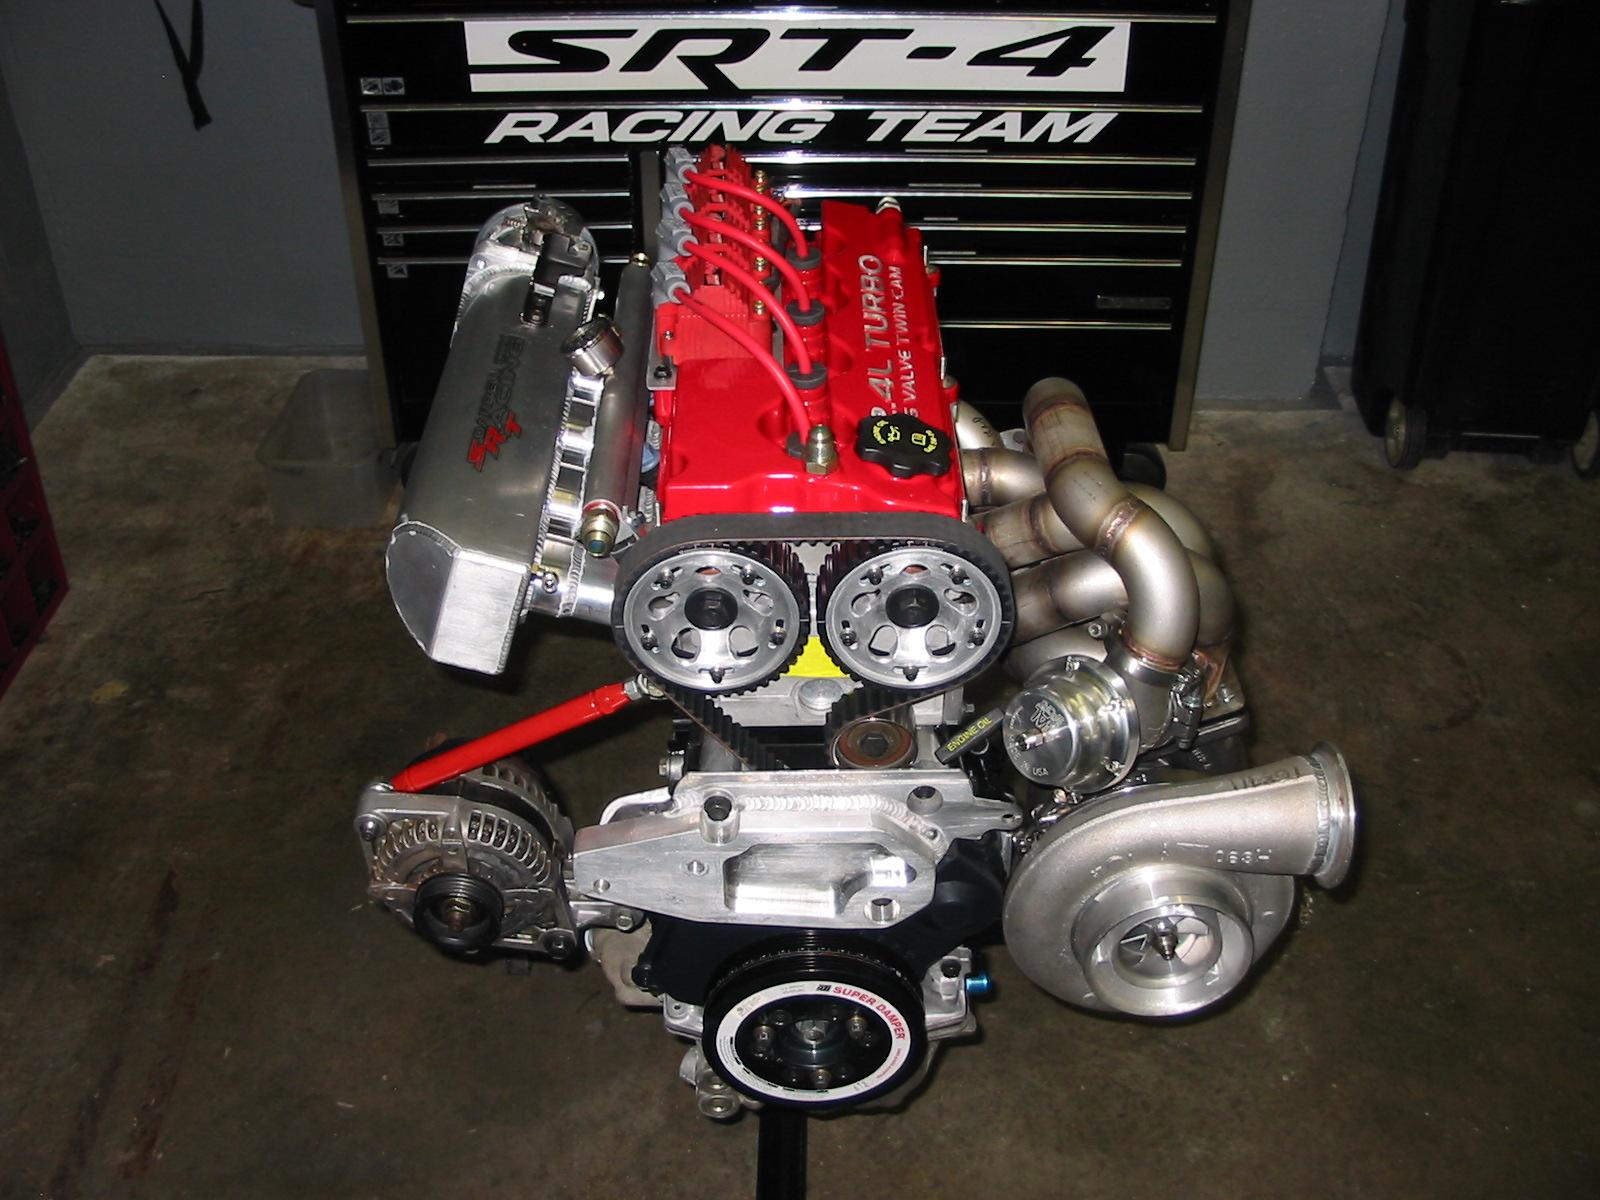 420a Engine Block